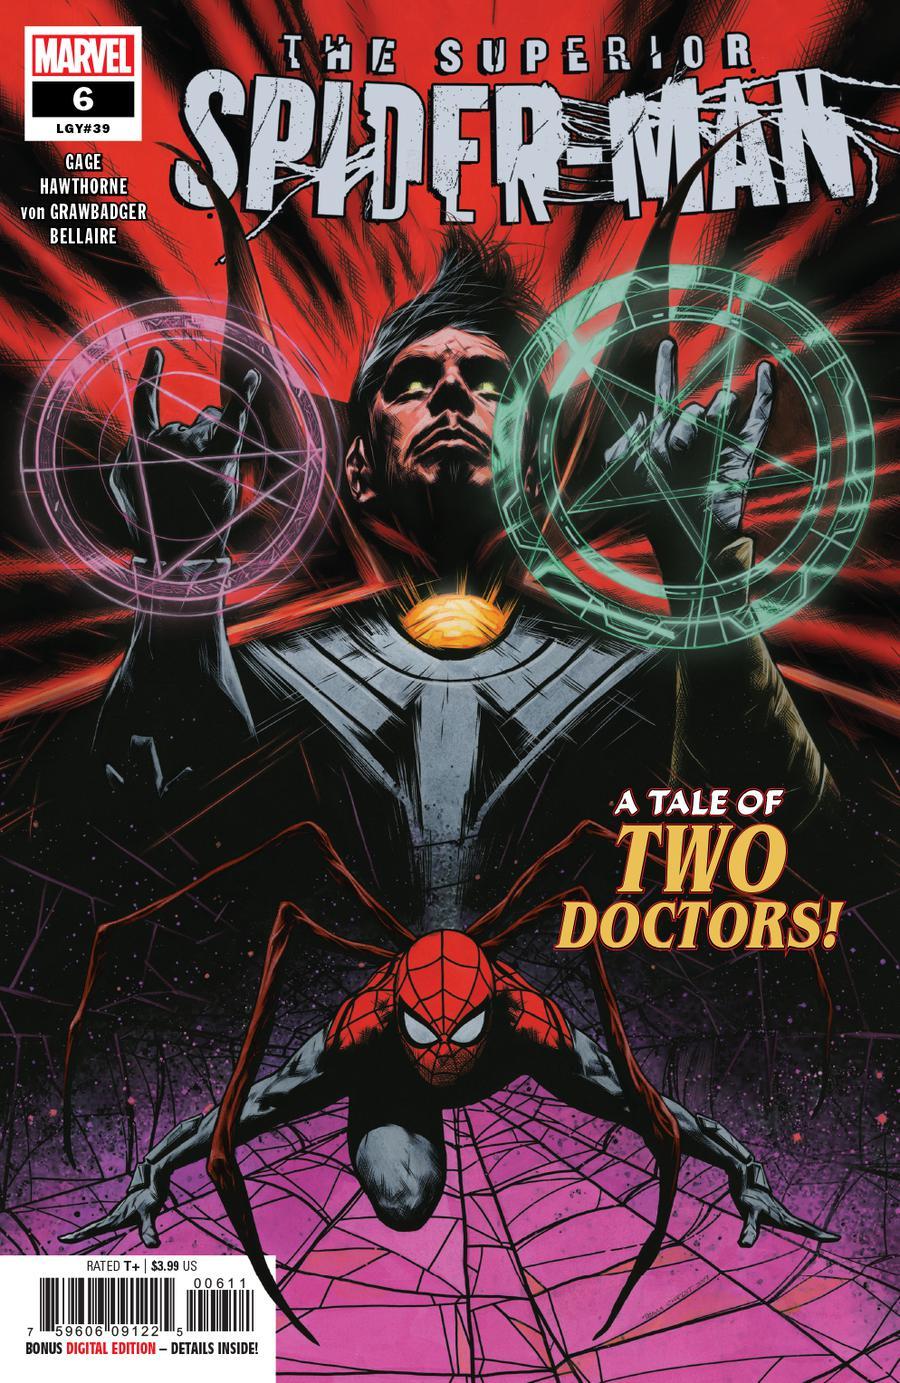 Superior Spider-Man Vol 2 #6